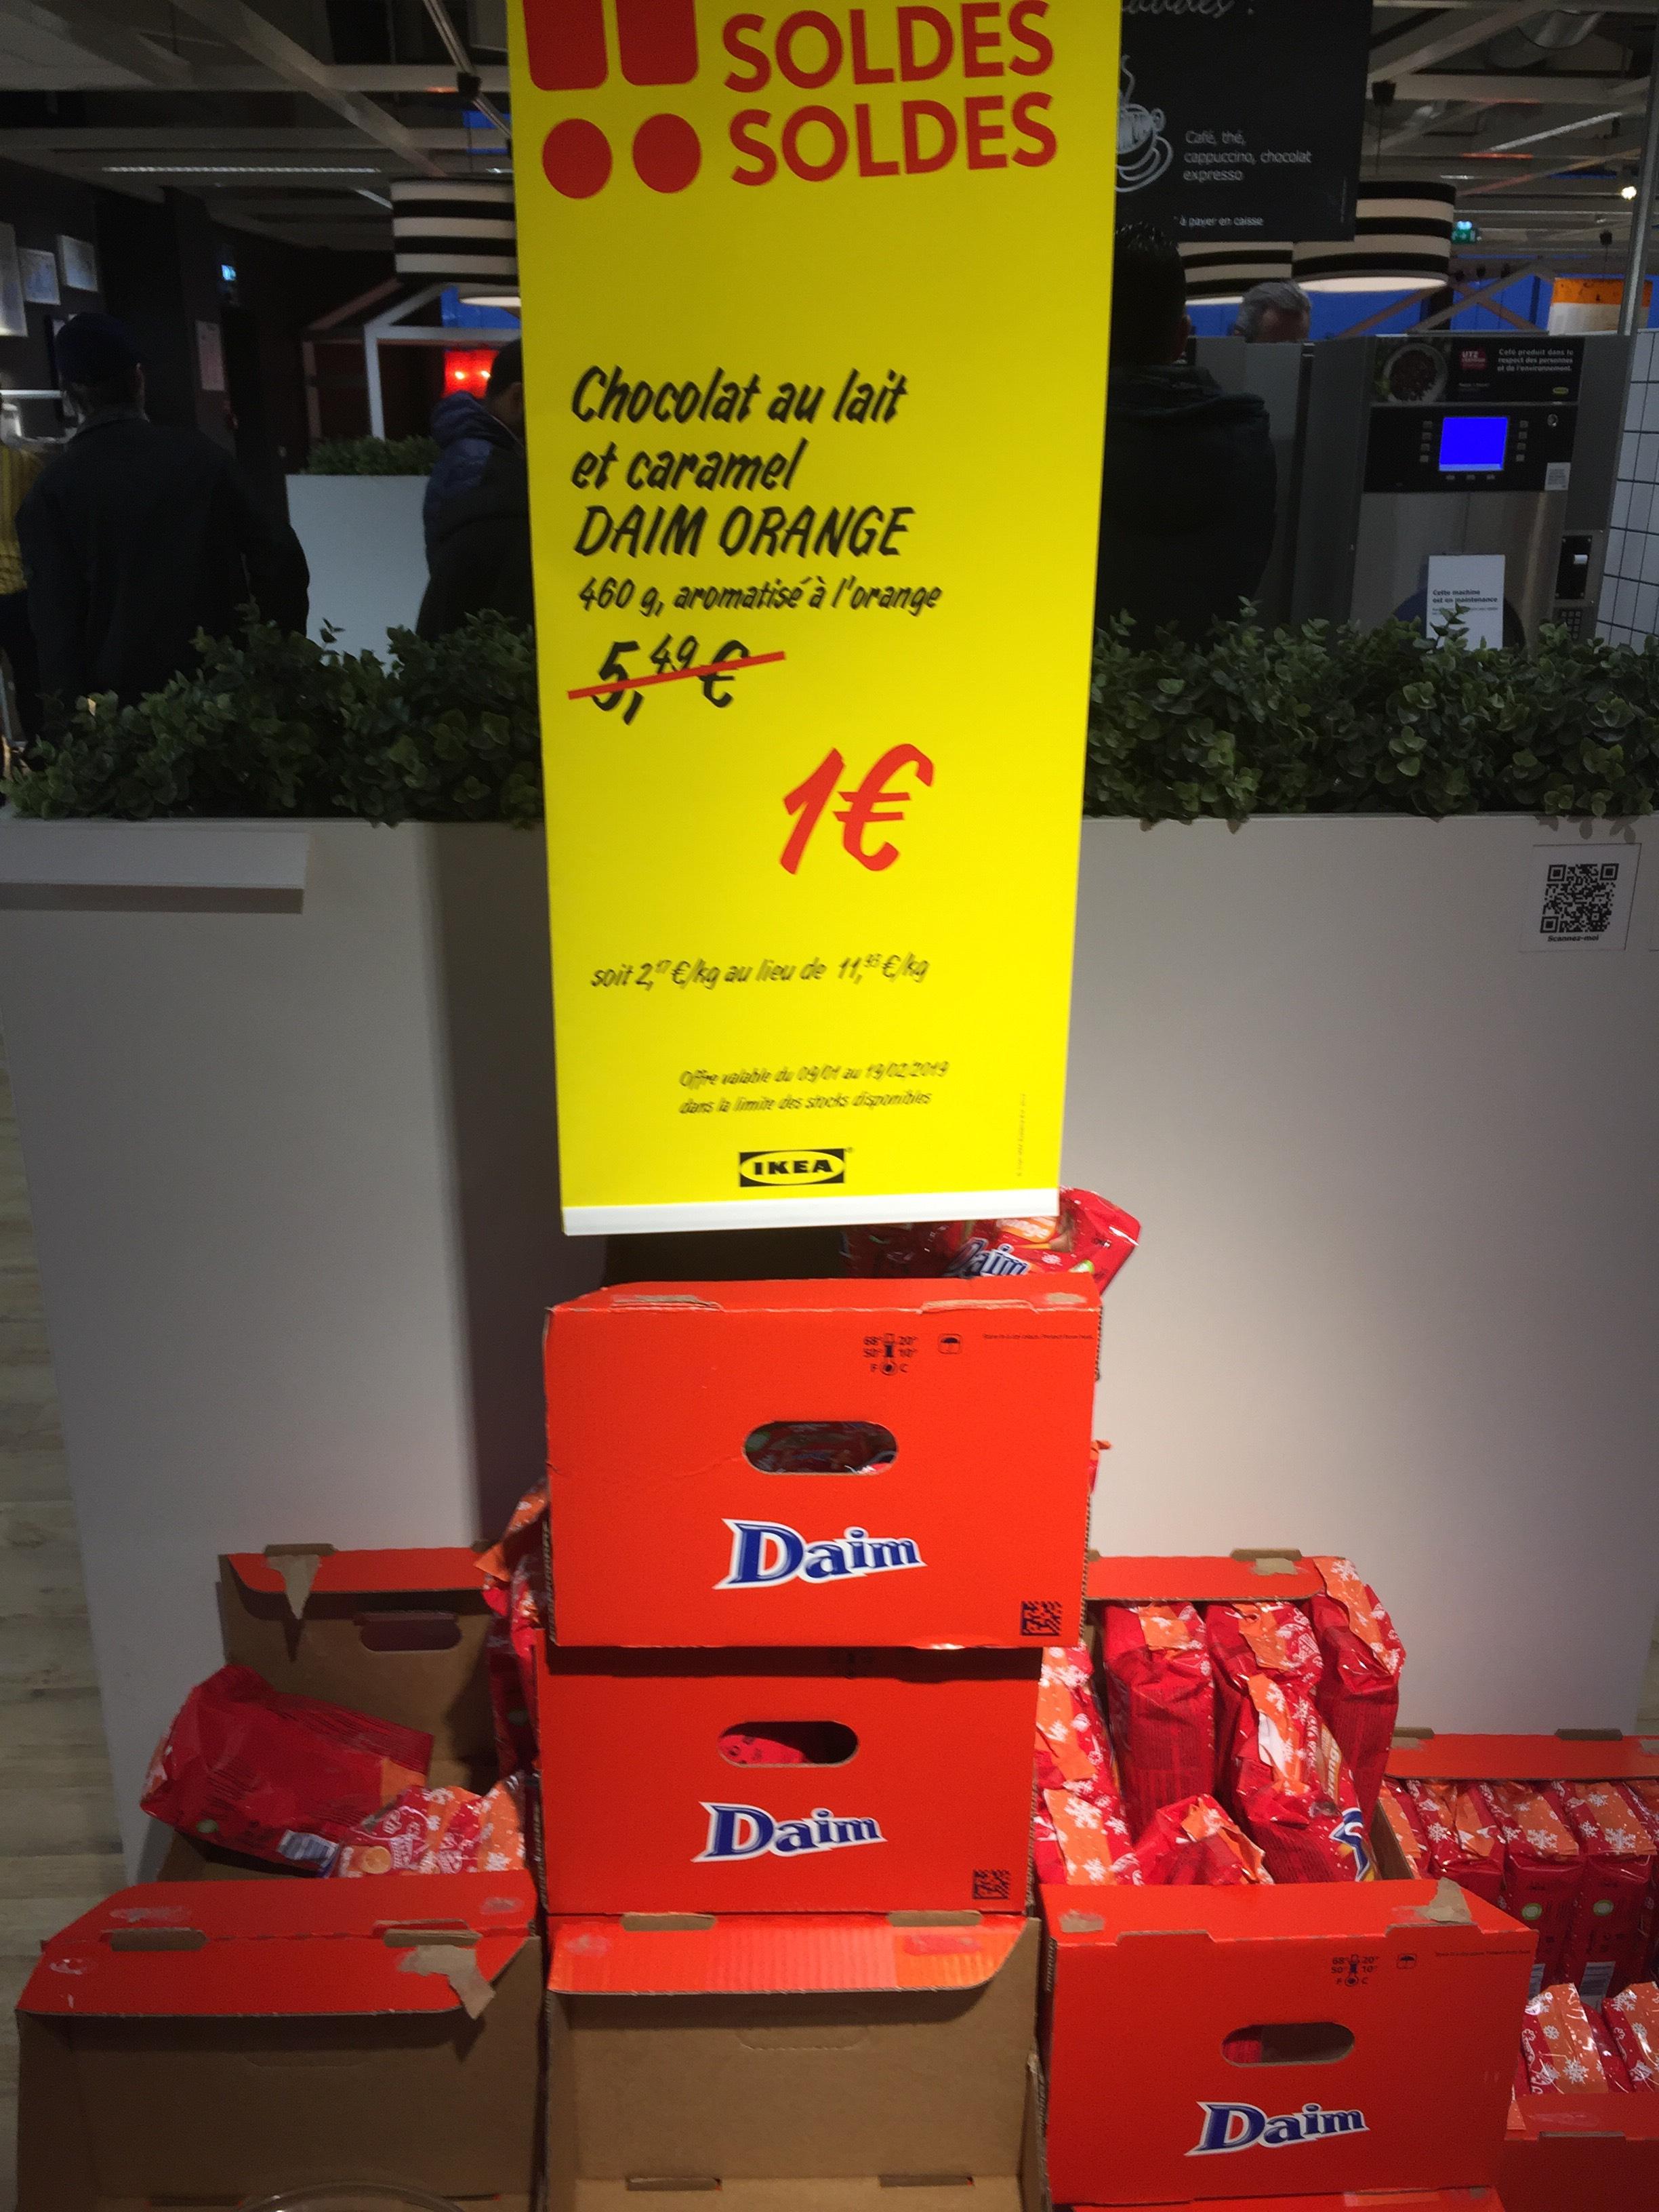 Sachet Daims Orange 460g - Strasbourg (67)